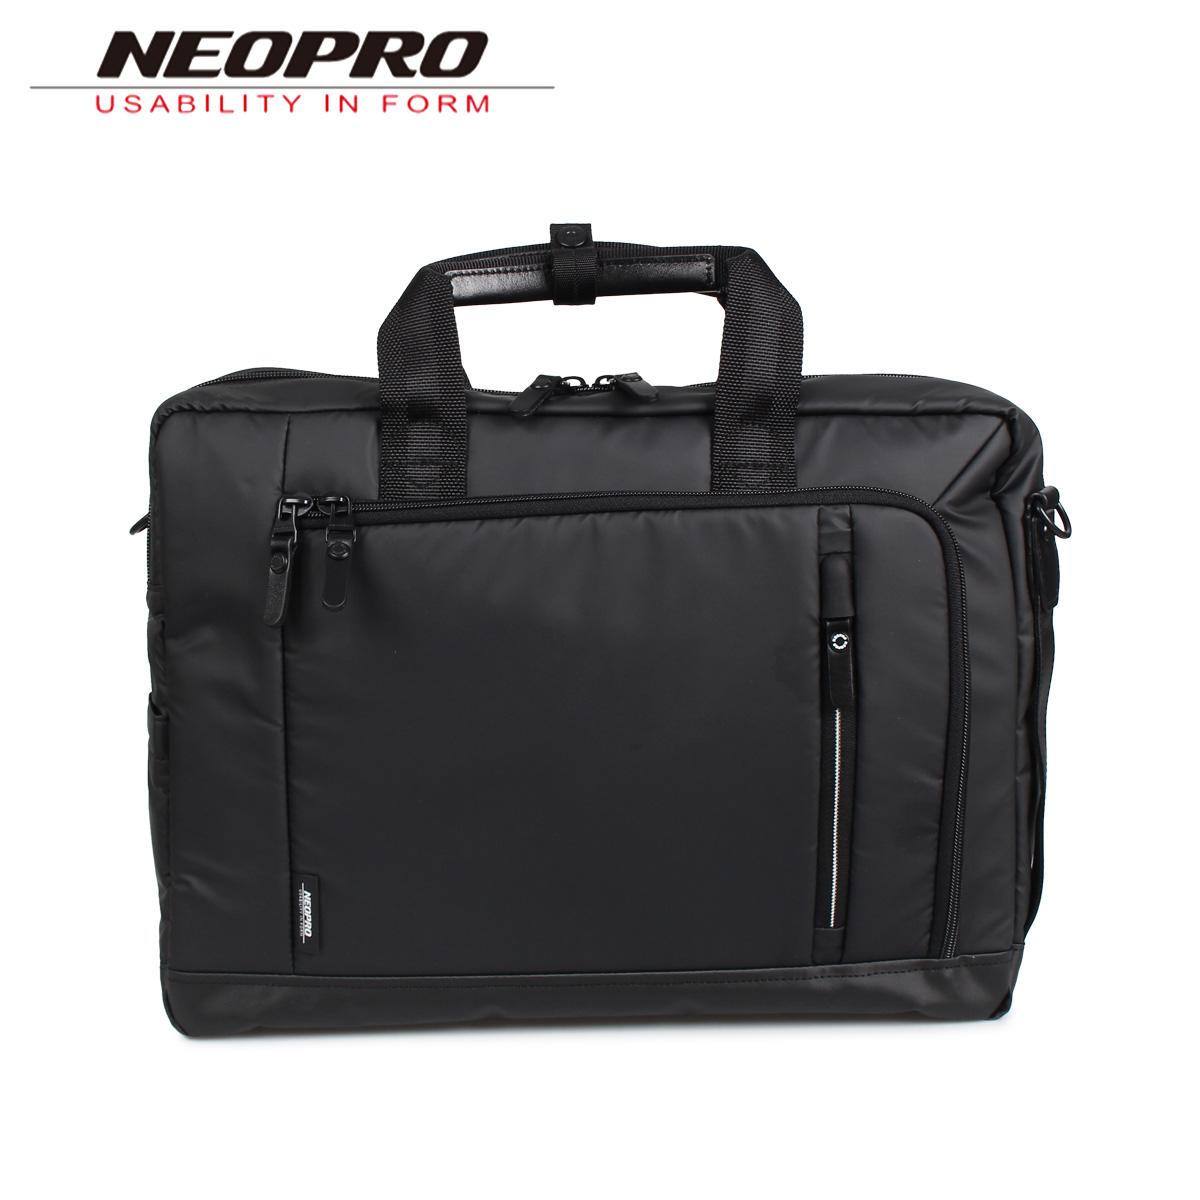 NEOPRO RED ネオプロ リュック バック バックパック ビジネスバッグ ショルダー メンズ 3WAY ブラック 黒 2-761